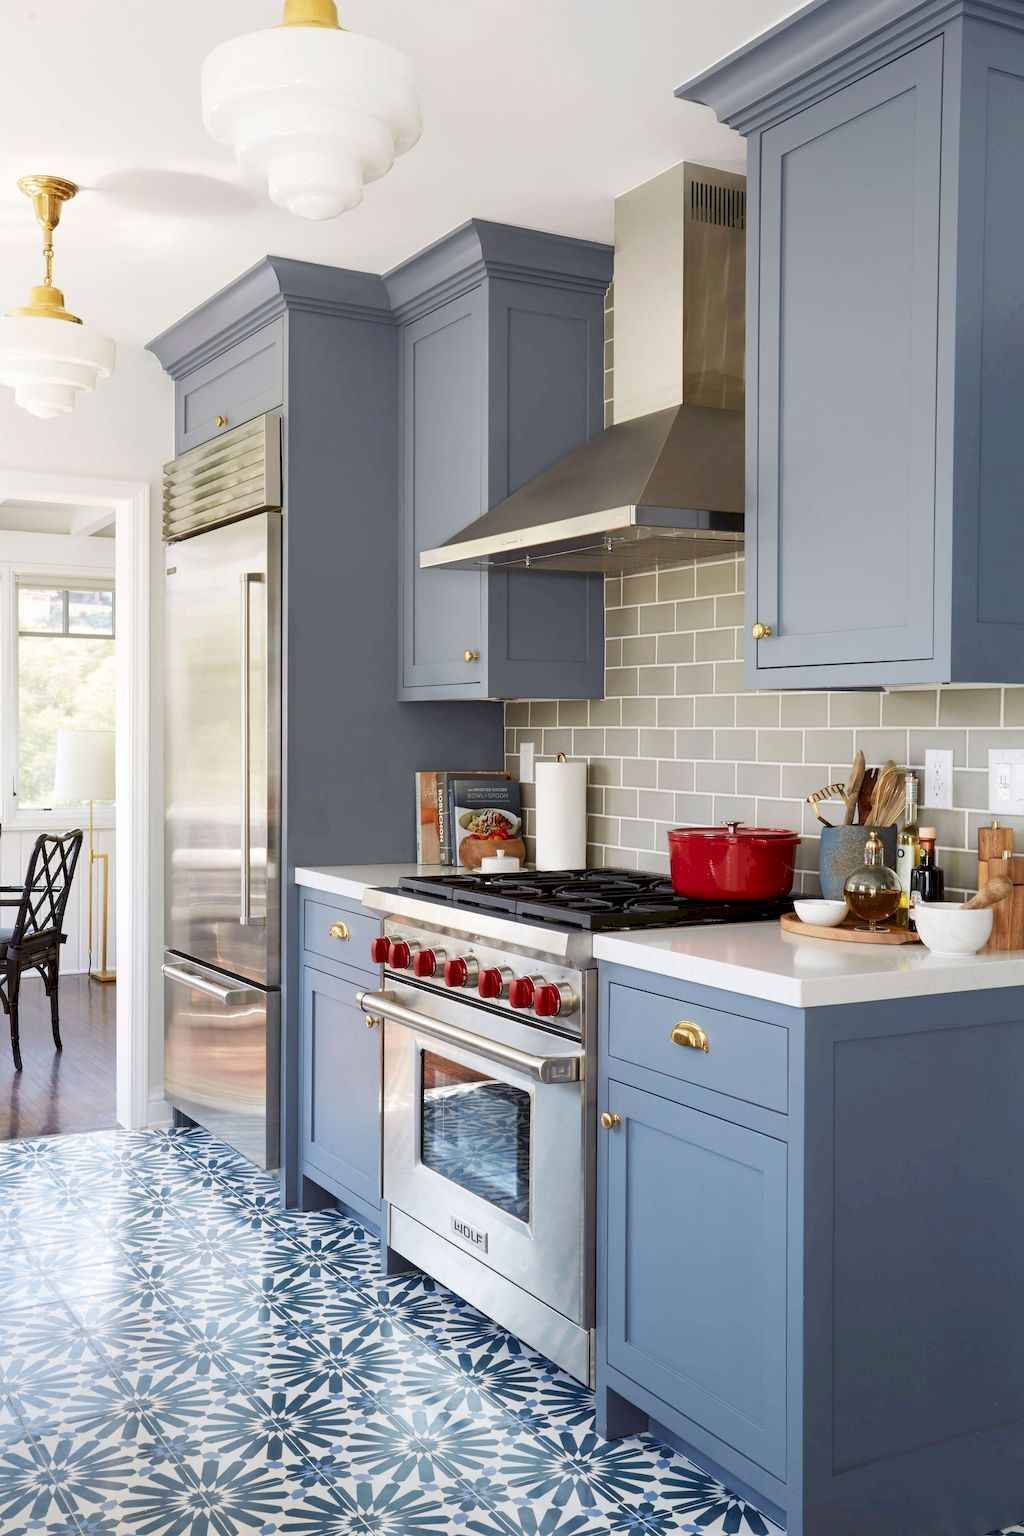 9 Gorgeous Farmhouse Kitchen Cabinets Makeover Ideas   Blue ...